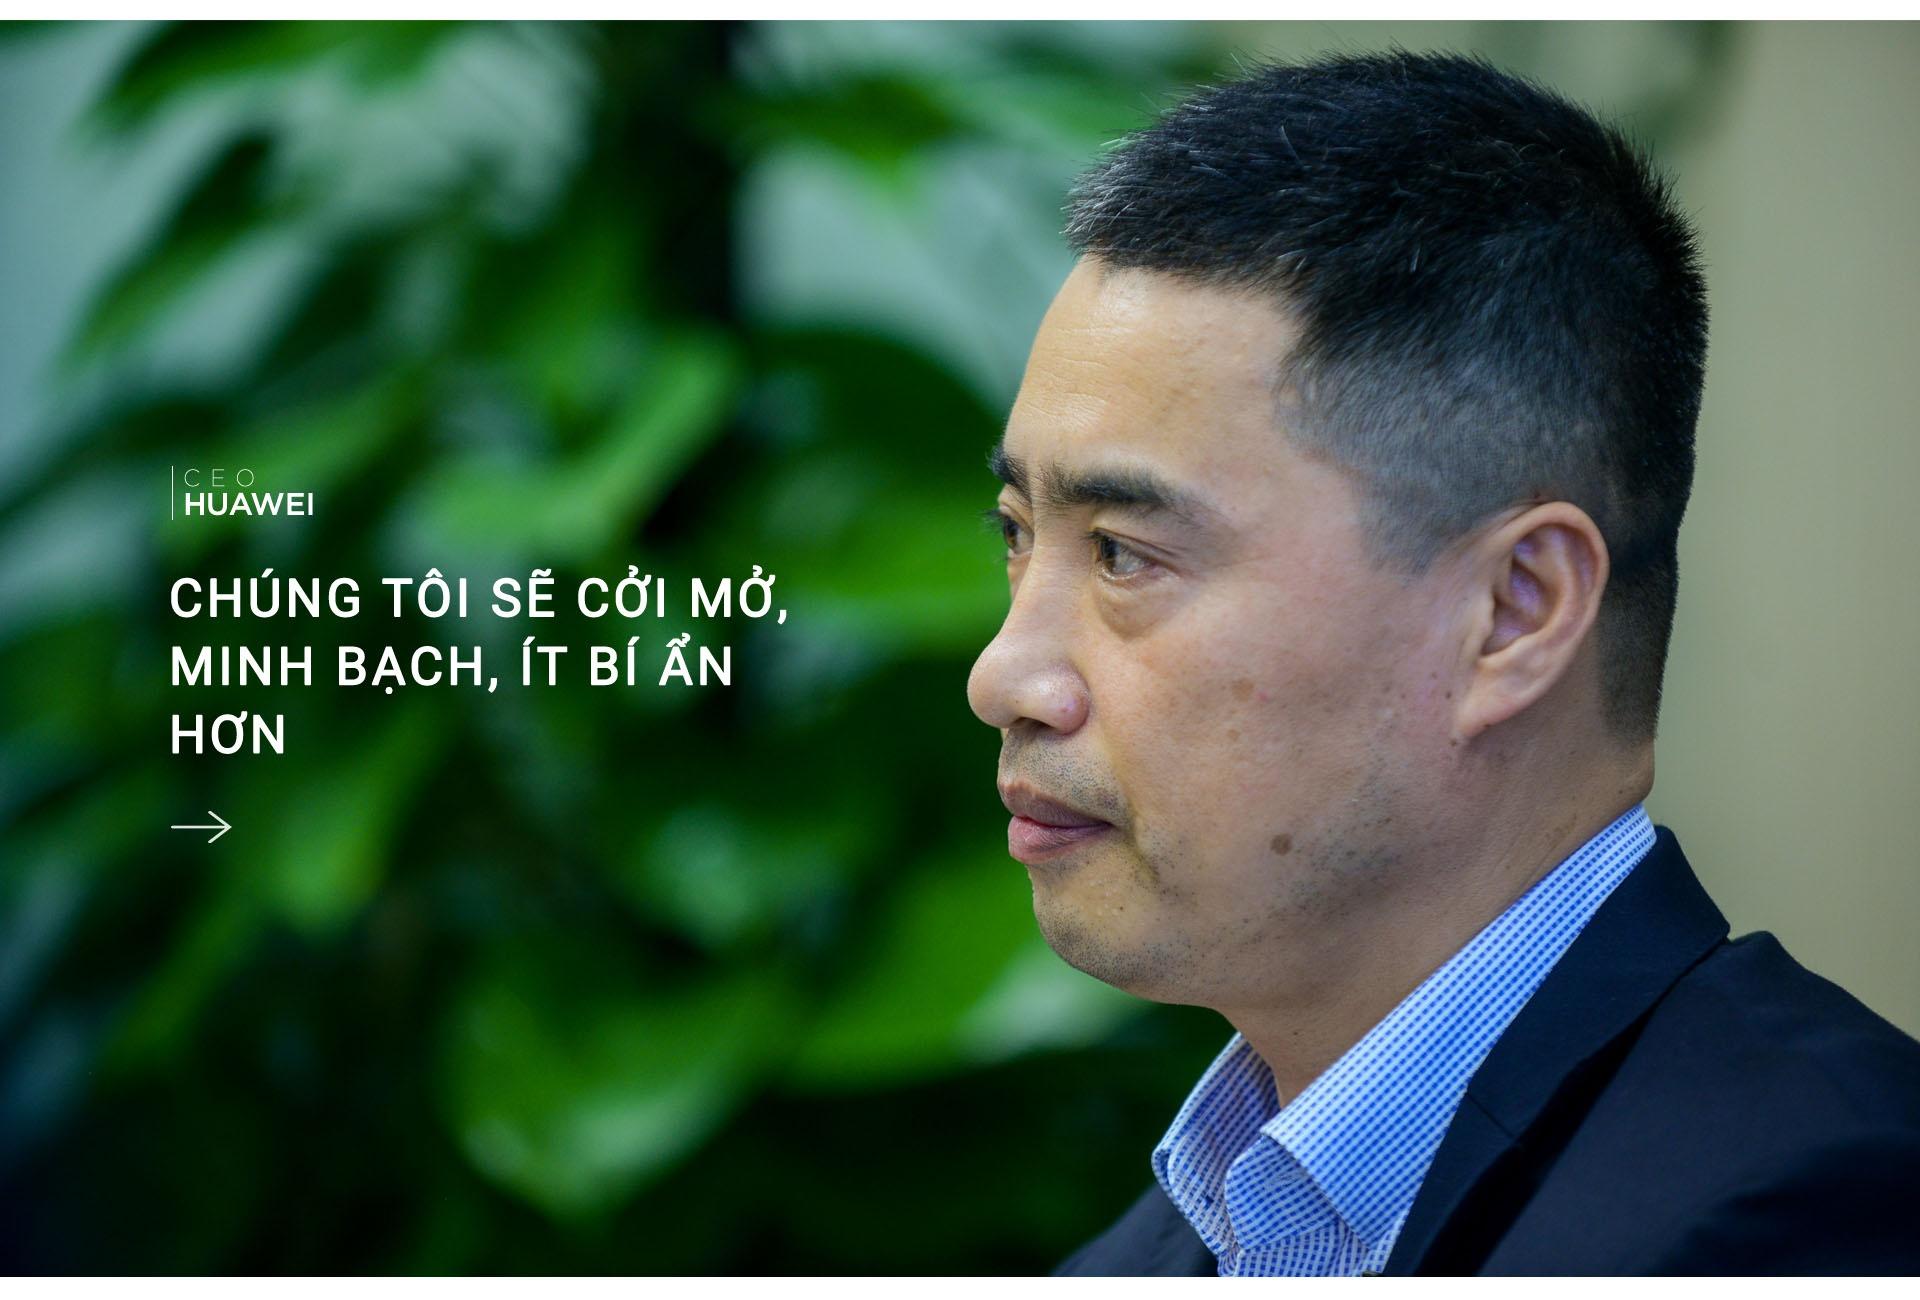 CEO Huawei VN: 'Chung toi khong bi an nhu moi nguoi nghi' hinh anh 13